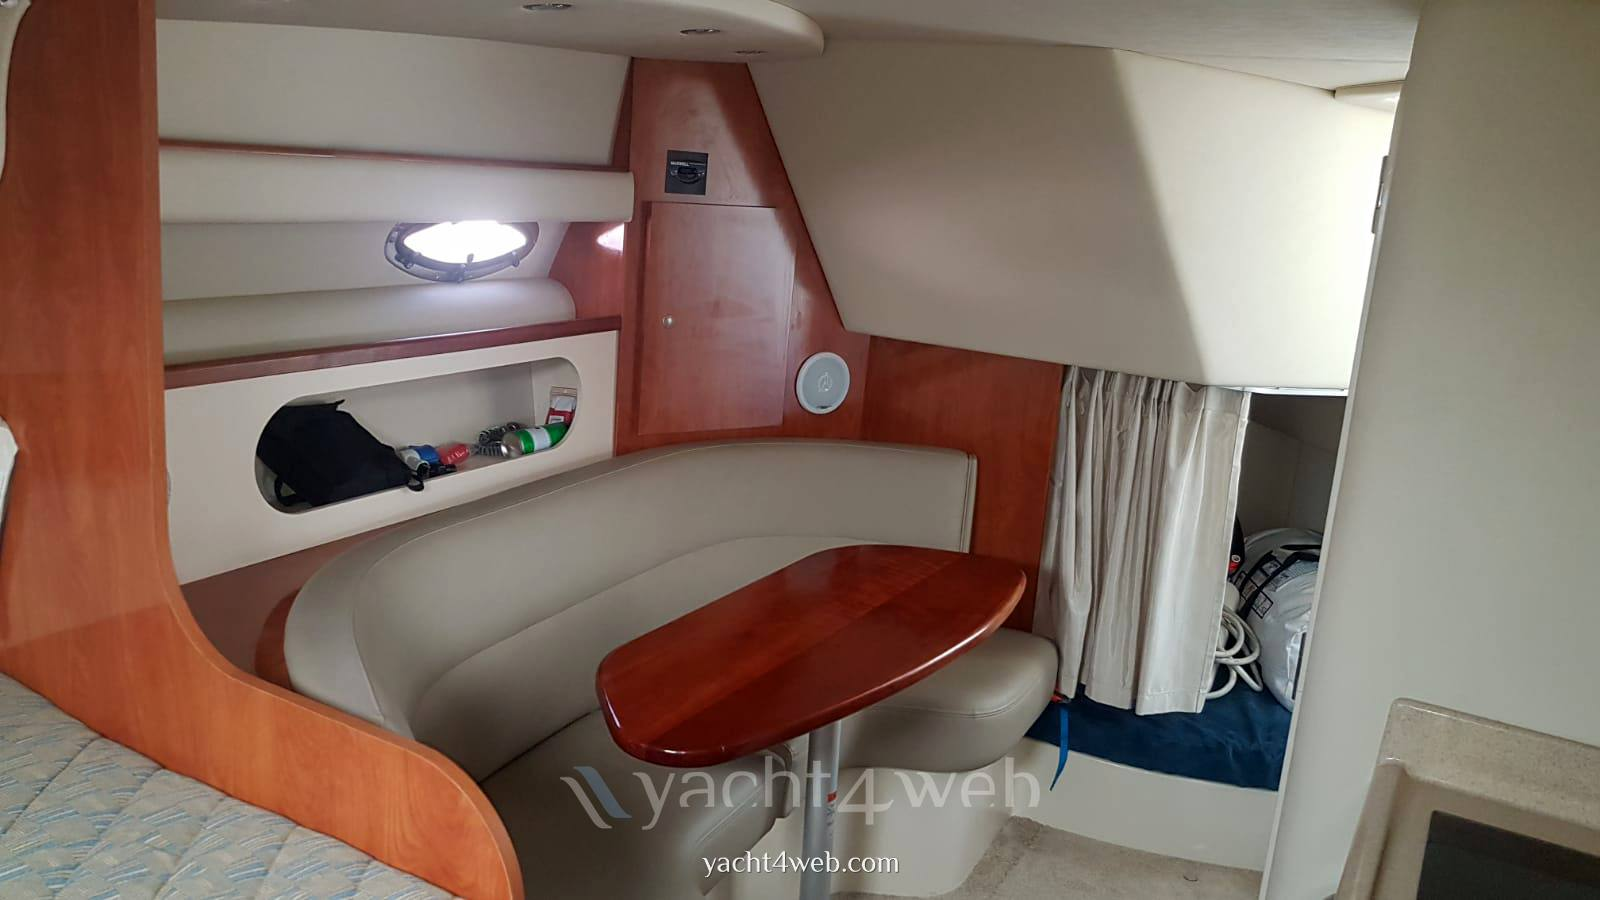 CRUISERS YACHTS Cruiser 280 express used